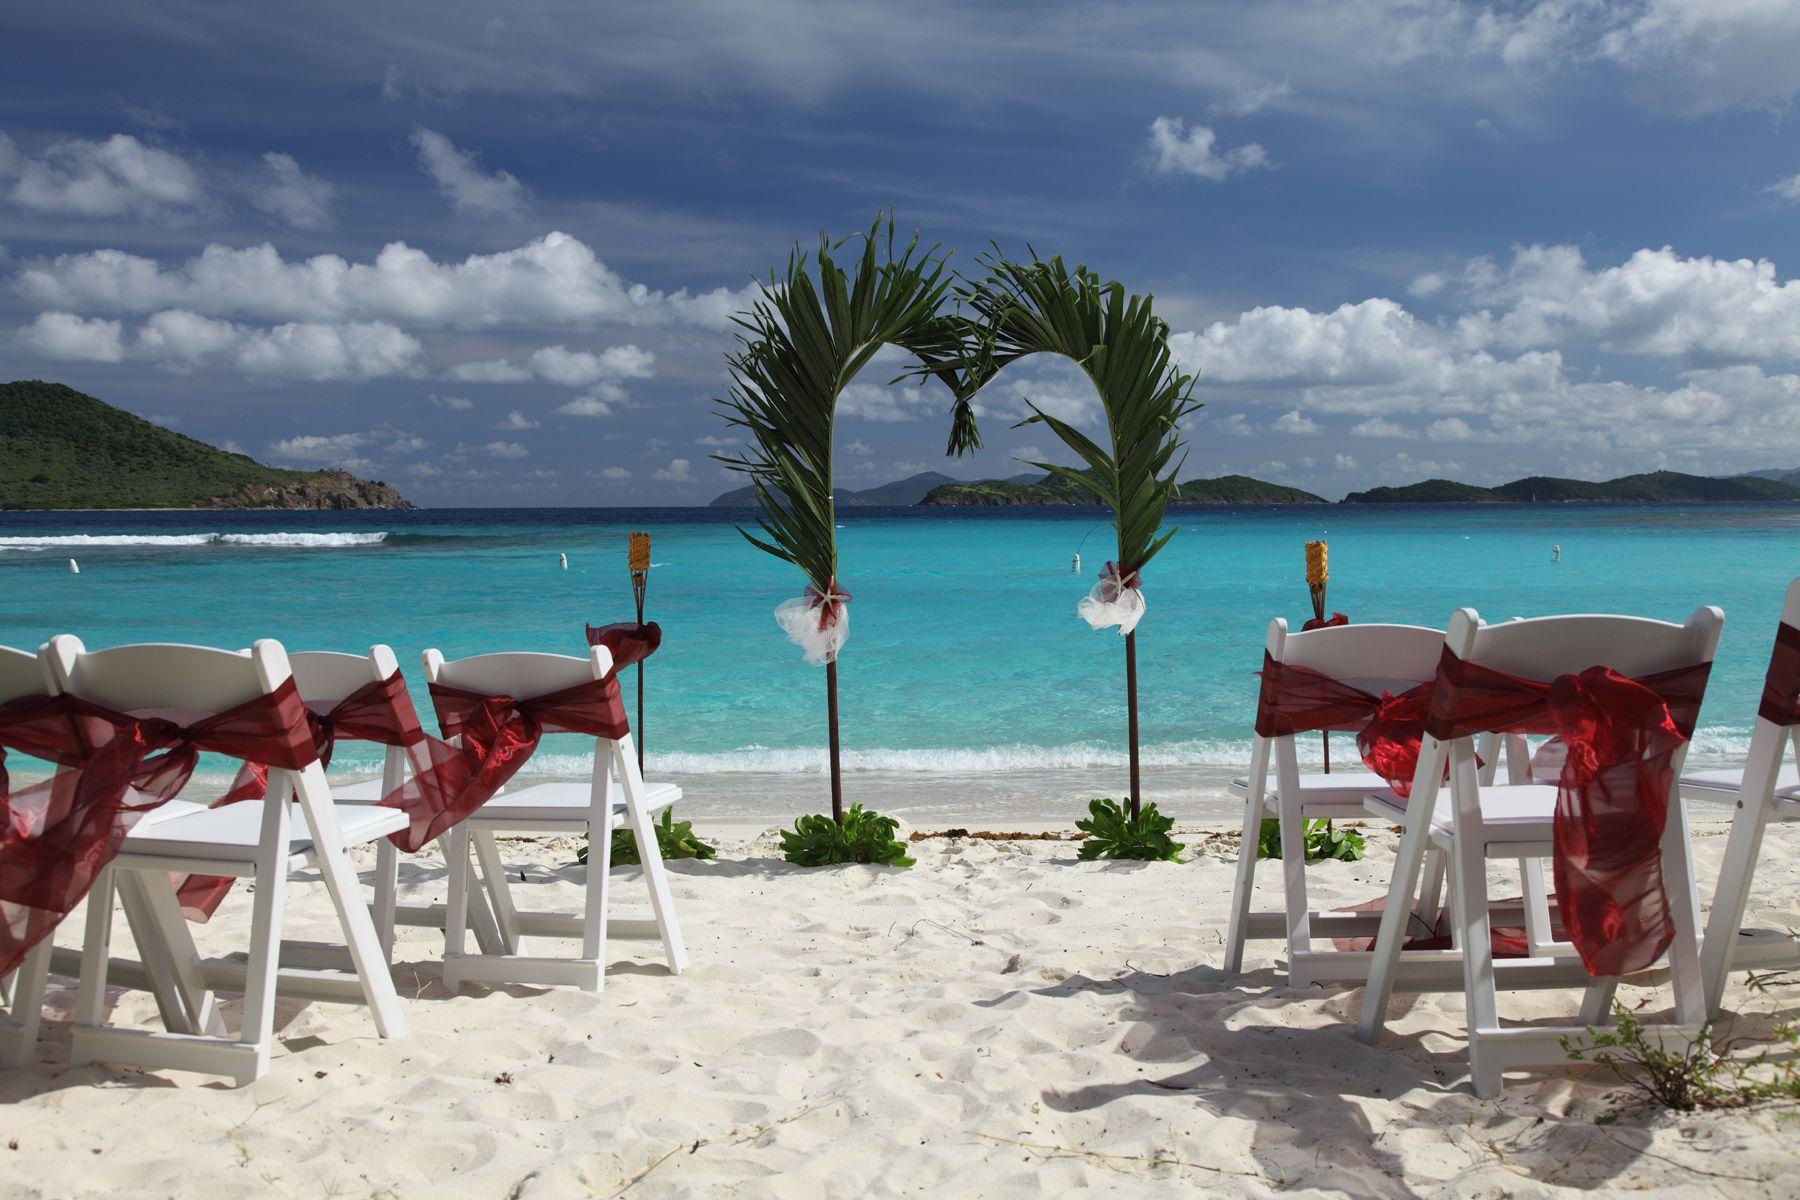 Tropical Beach Wedding Set Up Stthomaswedding Stthomasbeachwedding Stthomasweddingplanner Cruiseshipweddings